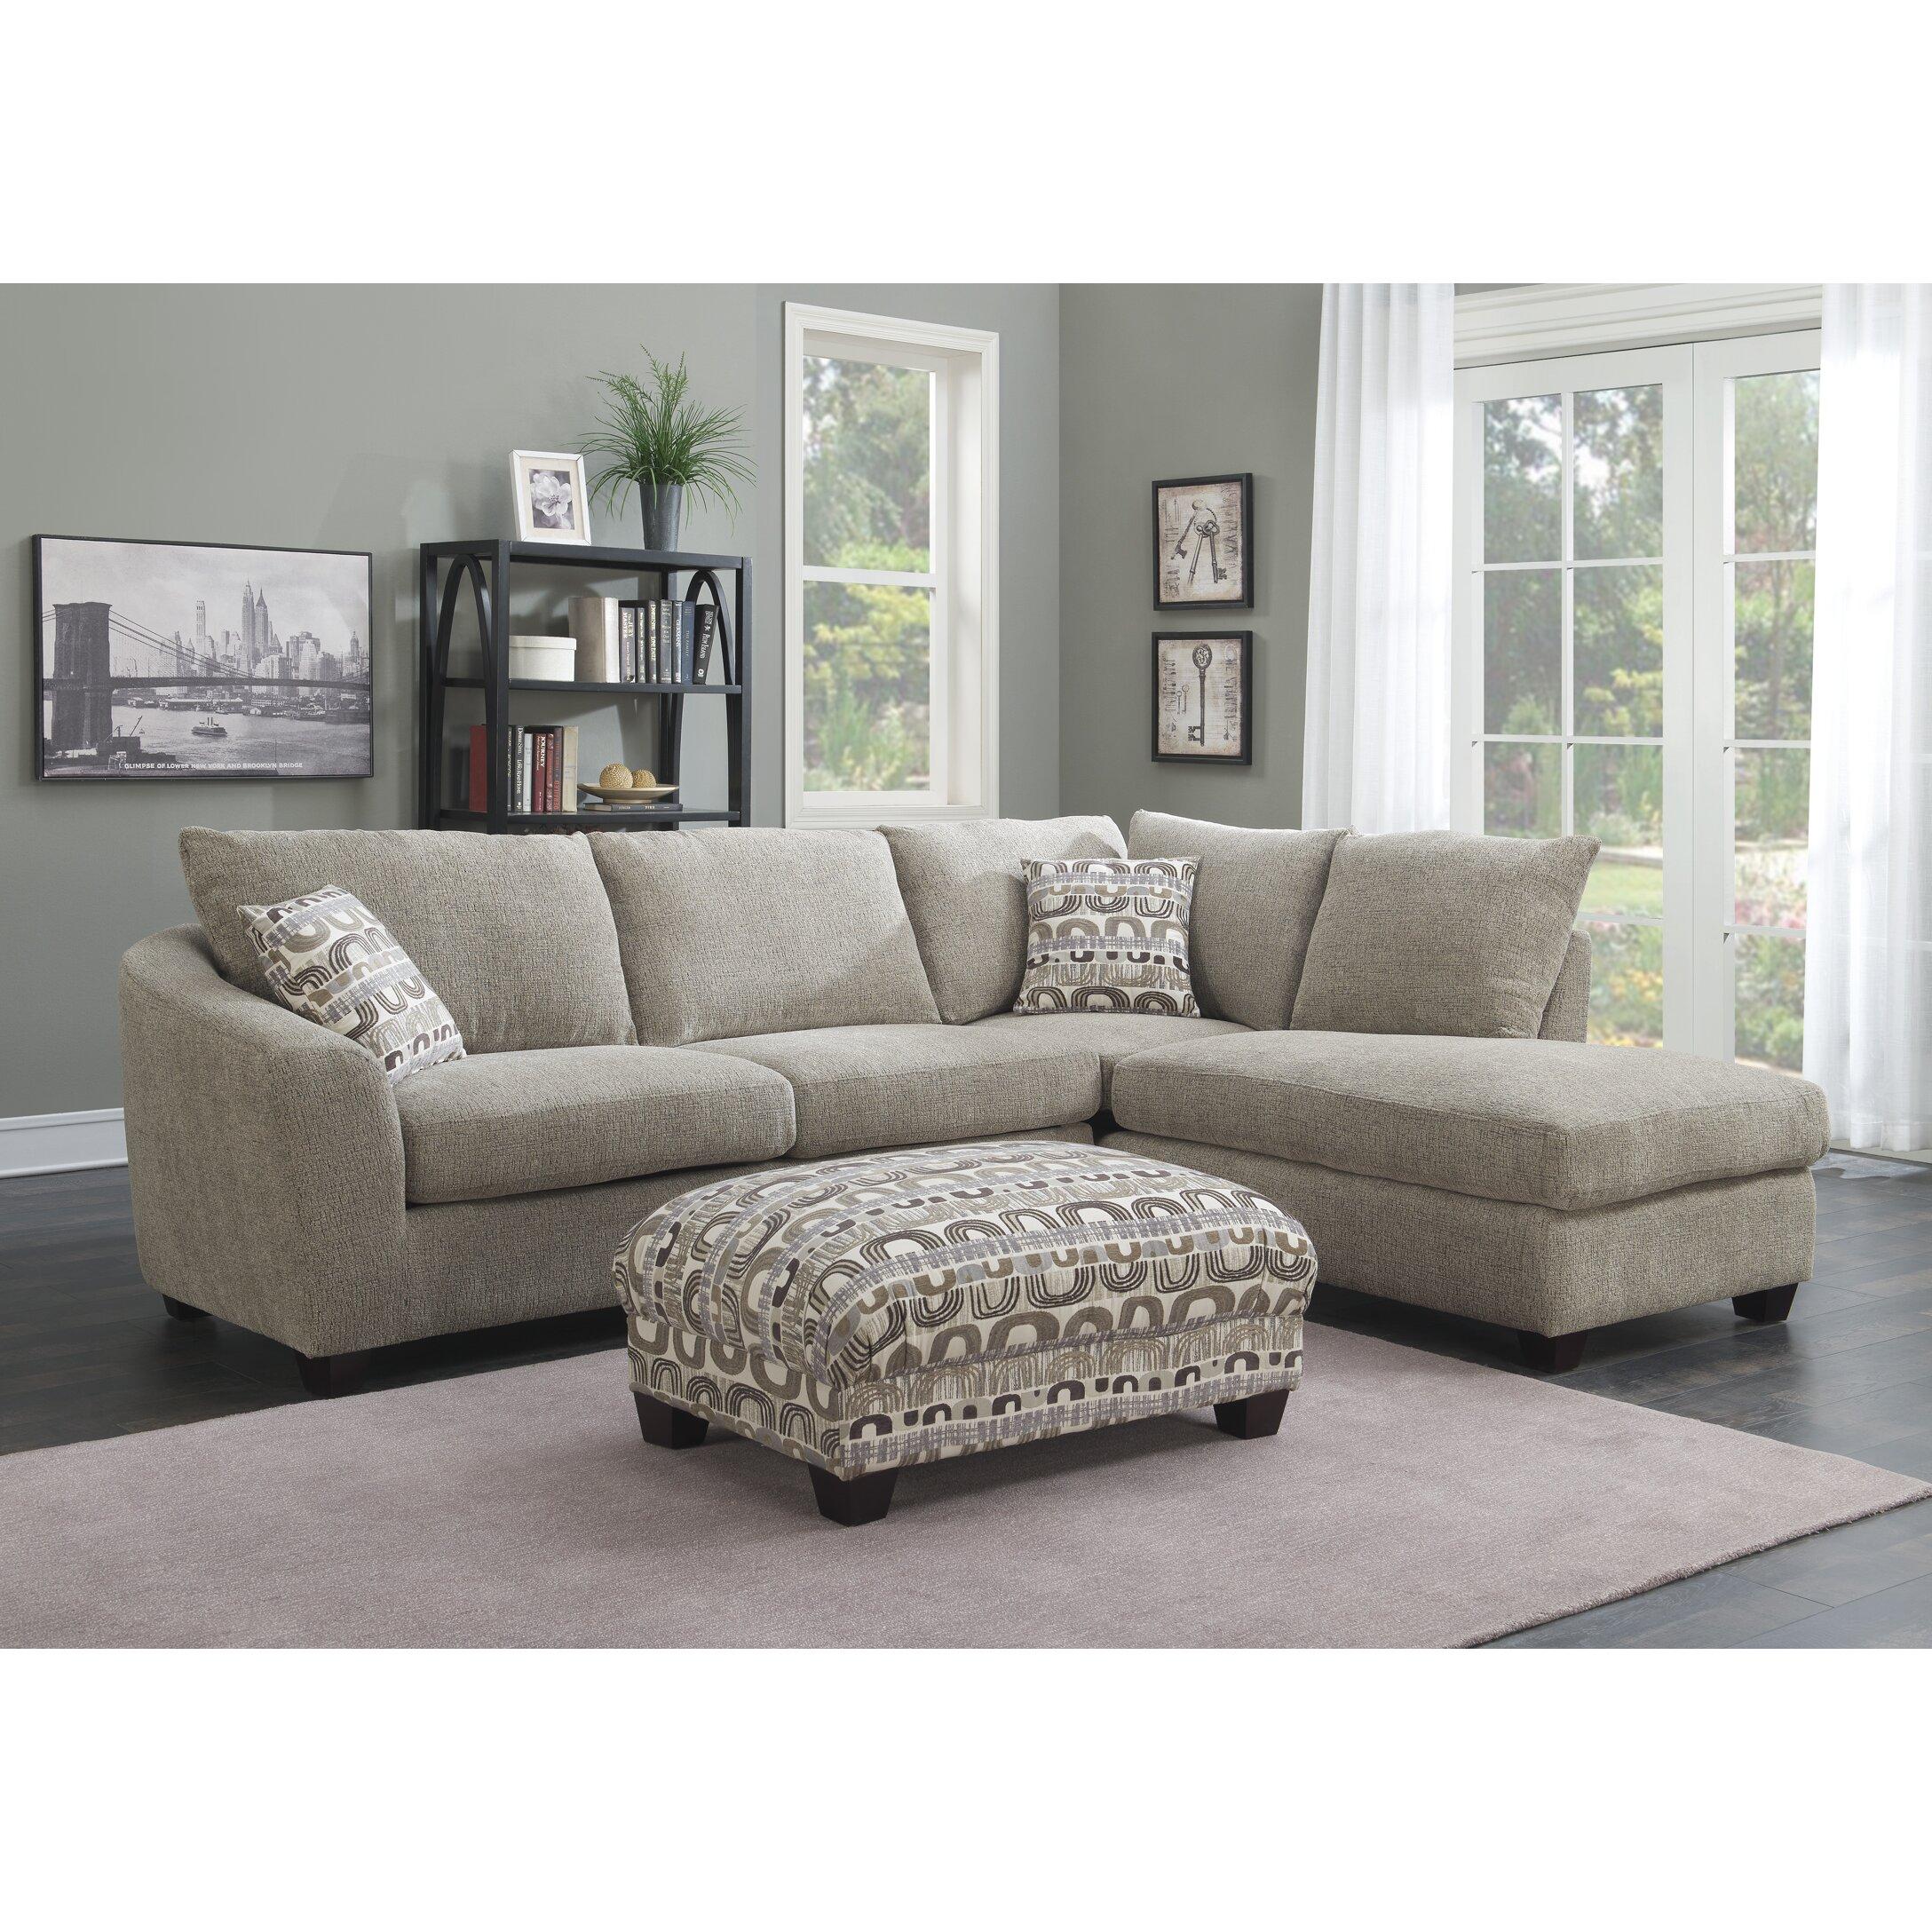 Modern Style Sectional Sofa hmmi